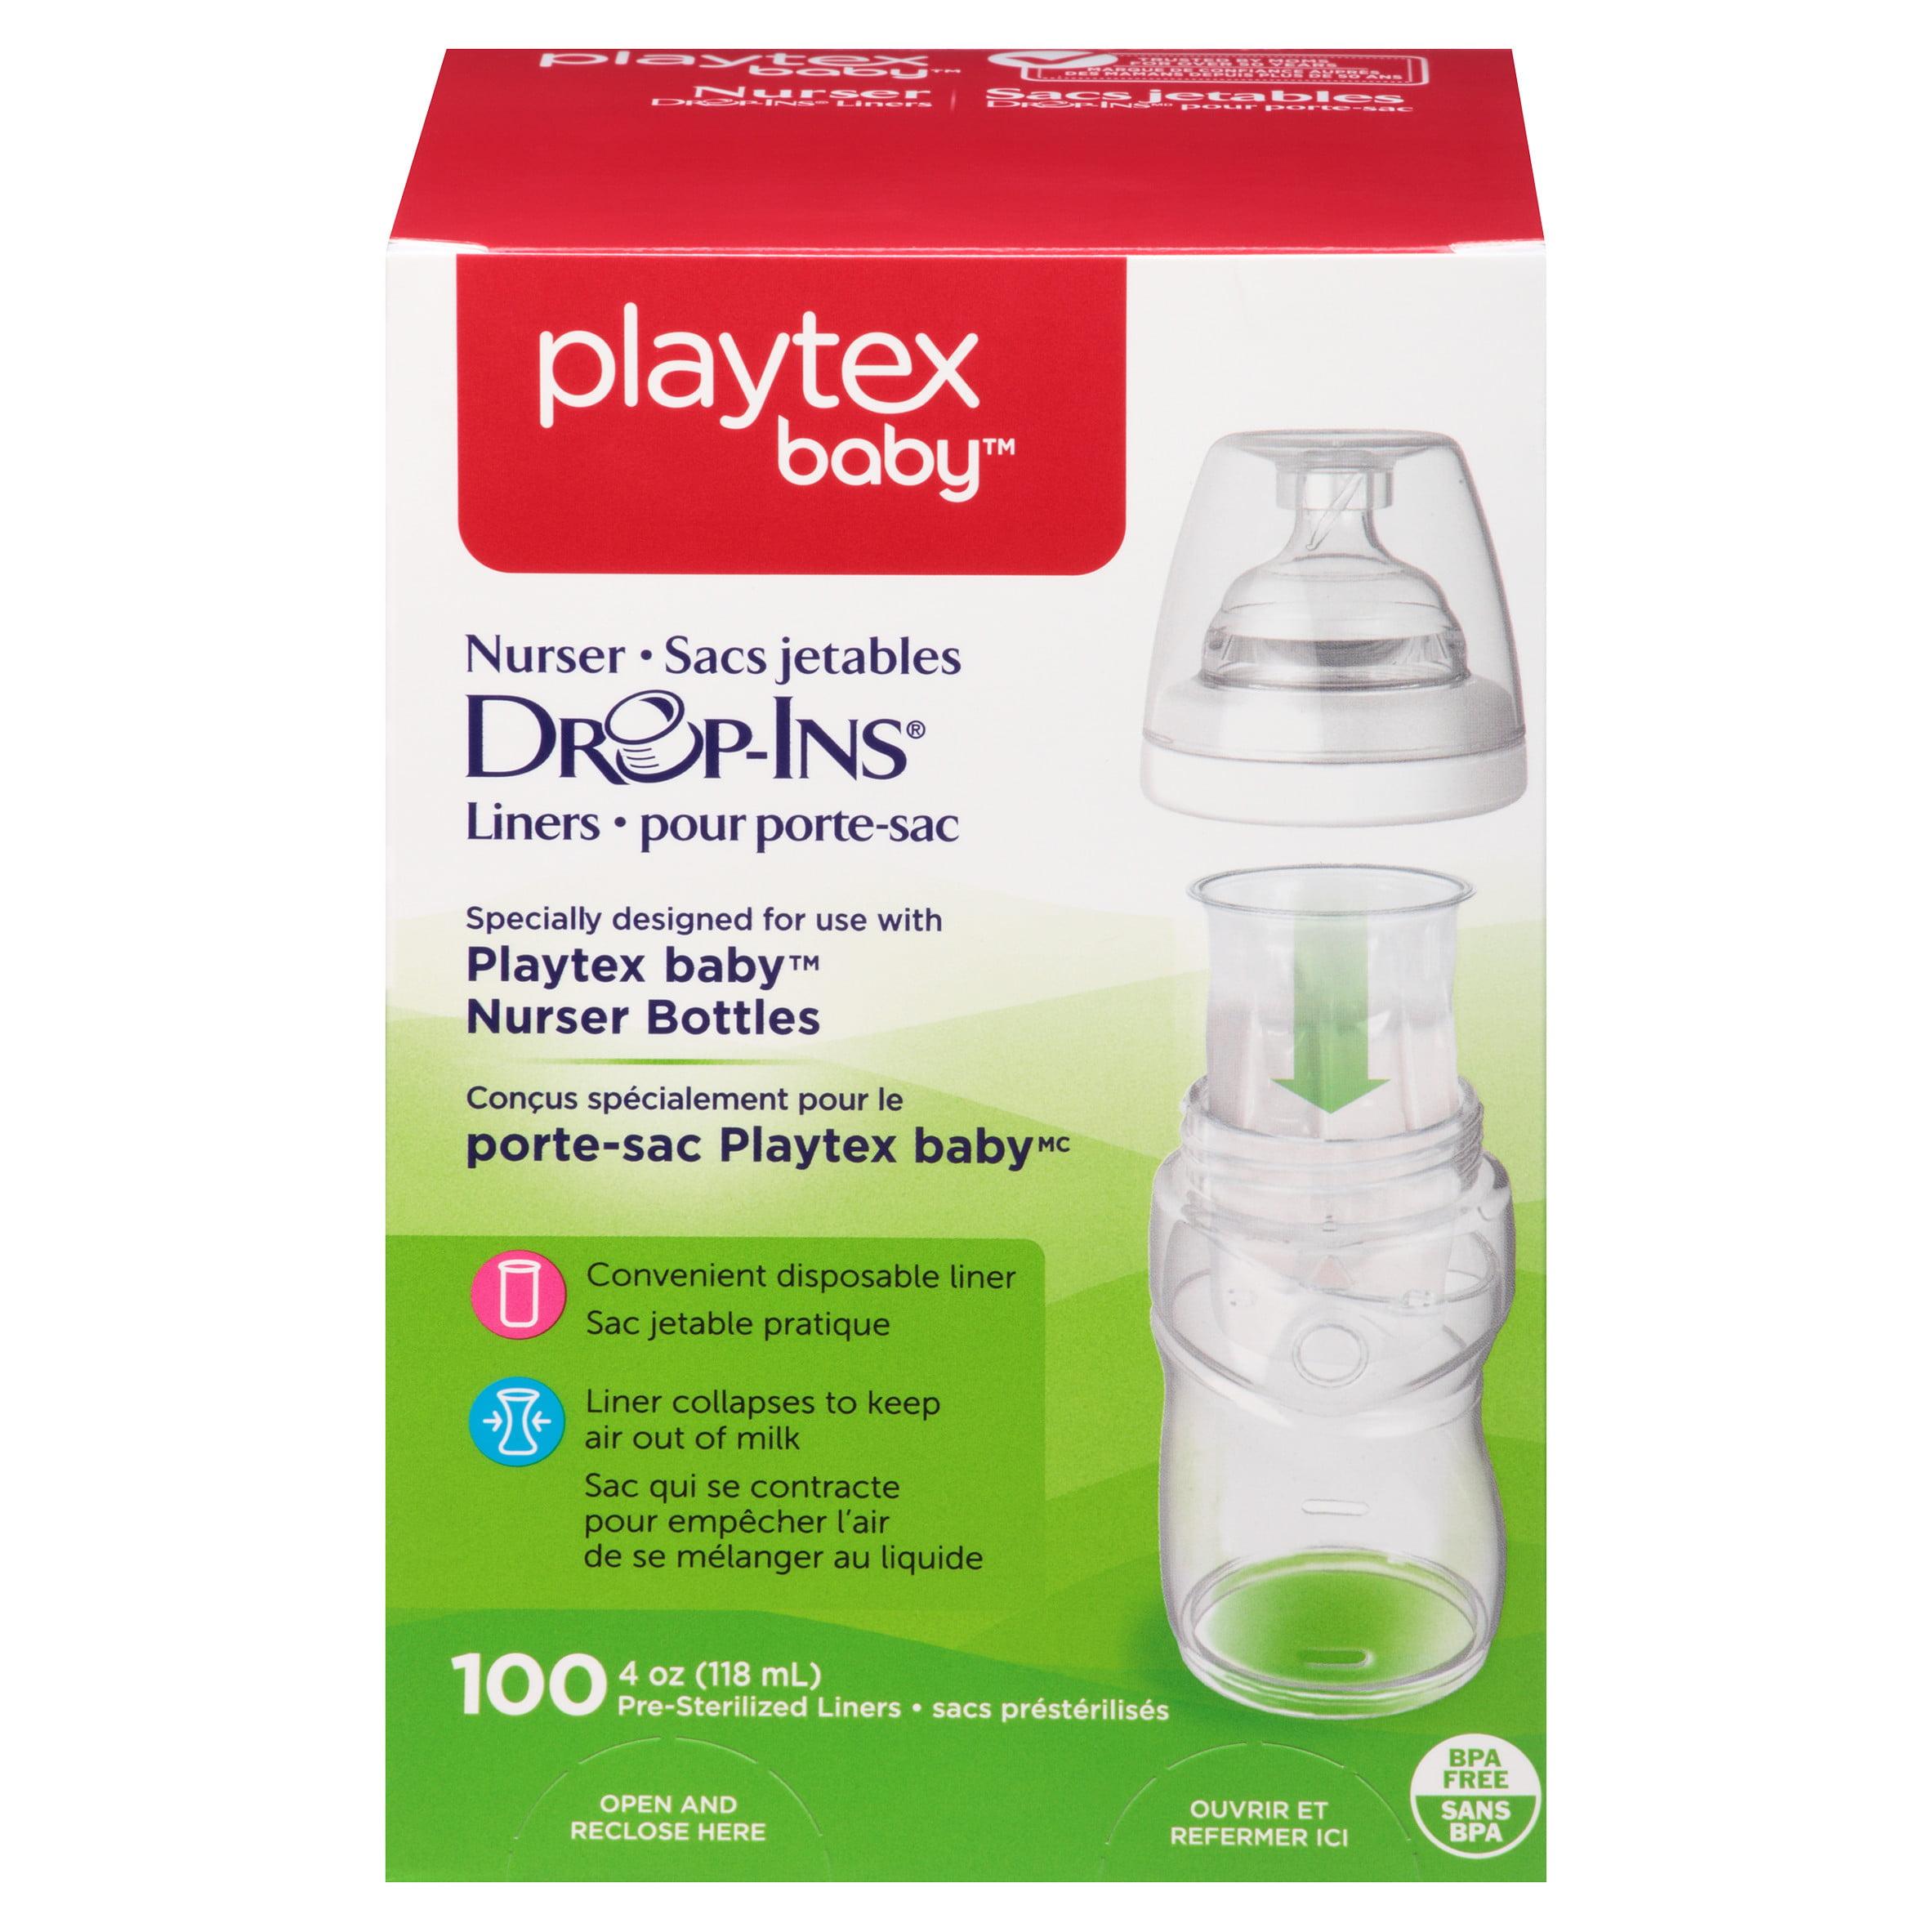 Playtex Baby Drop-Ins Liners For Playtex Baby Nurser Bottles 4-6oz 100 count